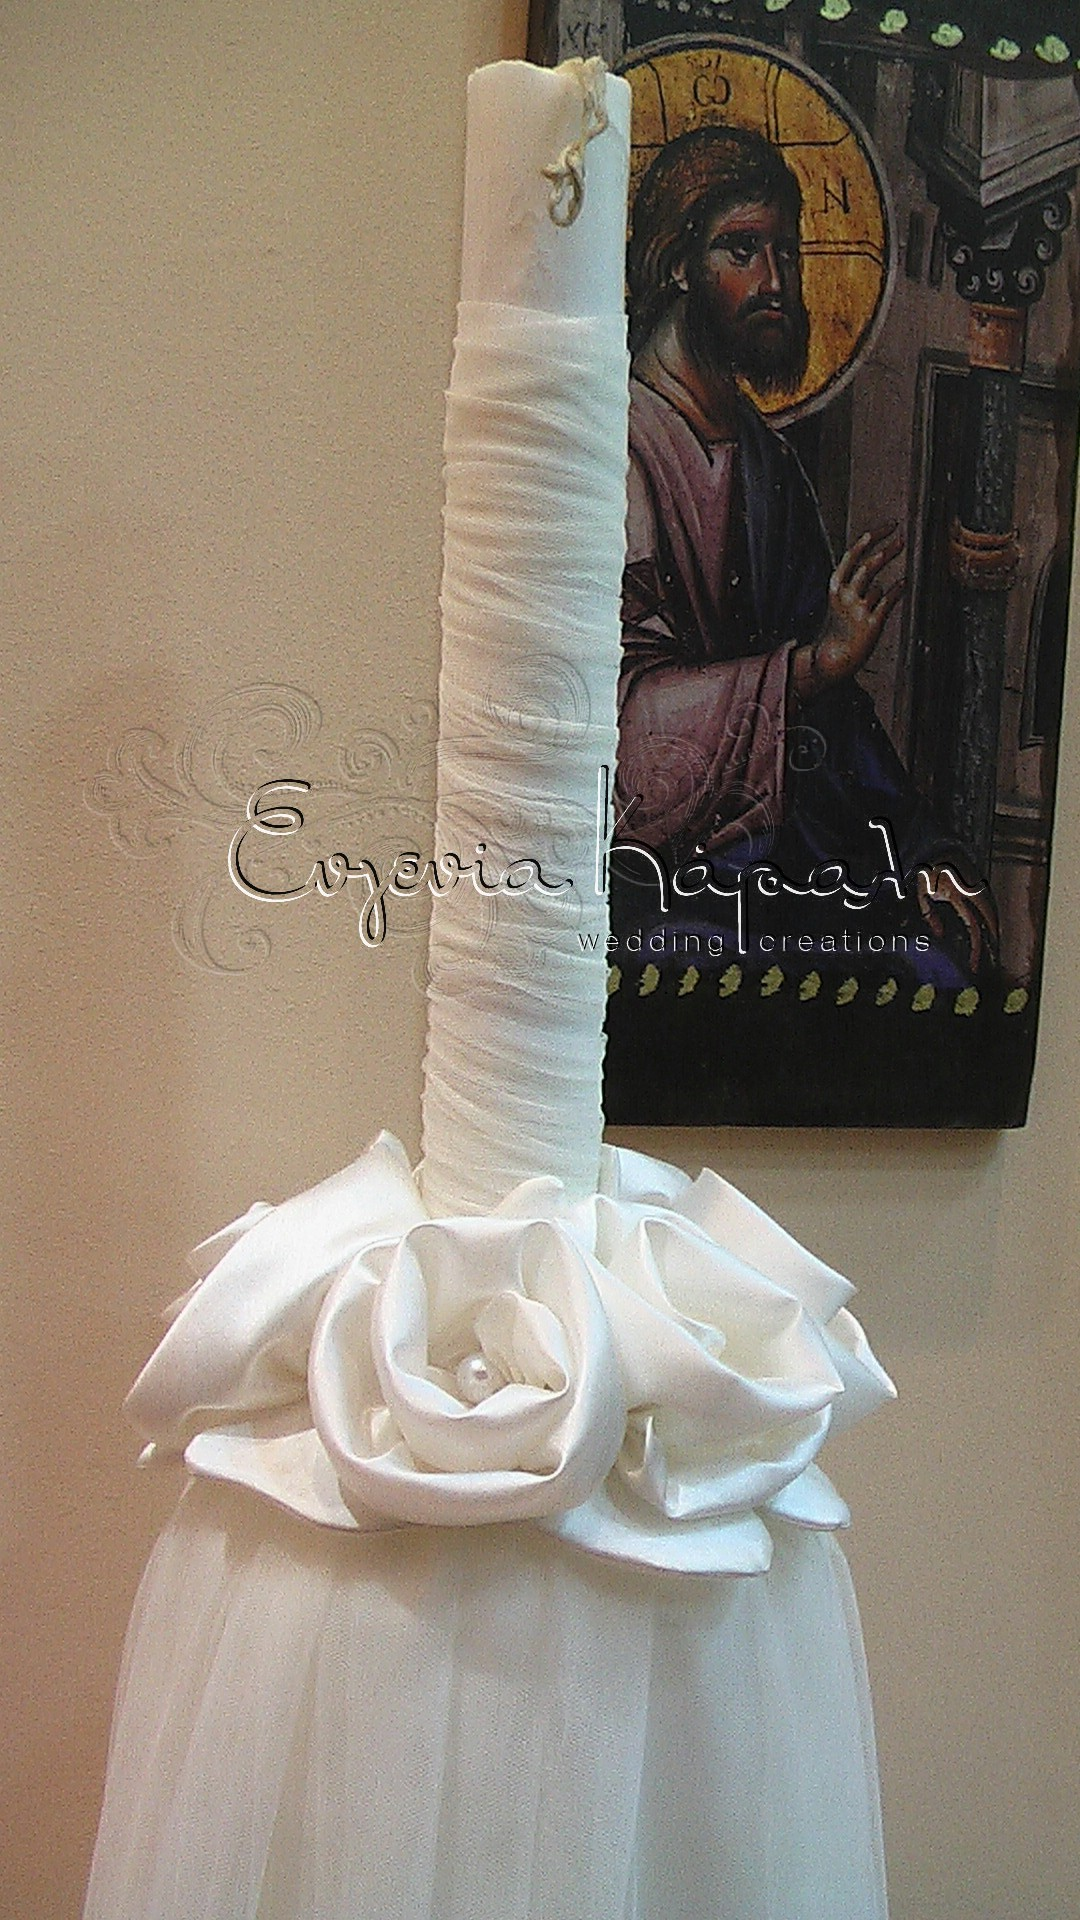 99626158a036 Λαμπάδες γάμου απο μεταξωτό τούλι στην Νίκαια Αθήνας